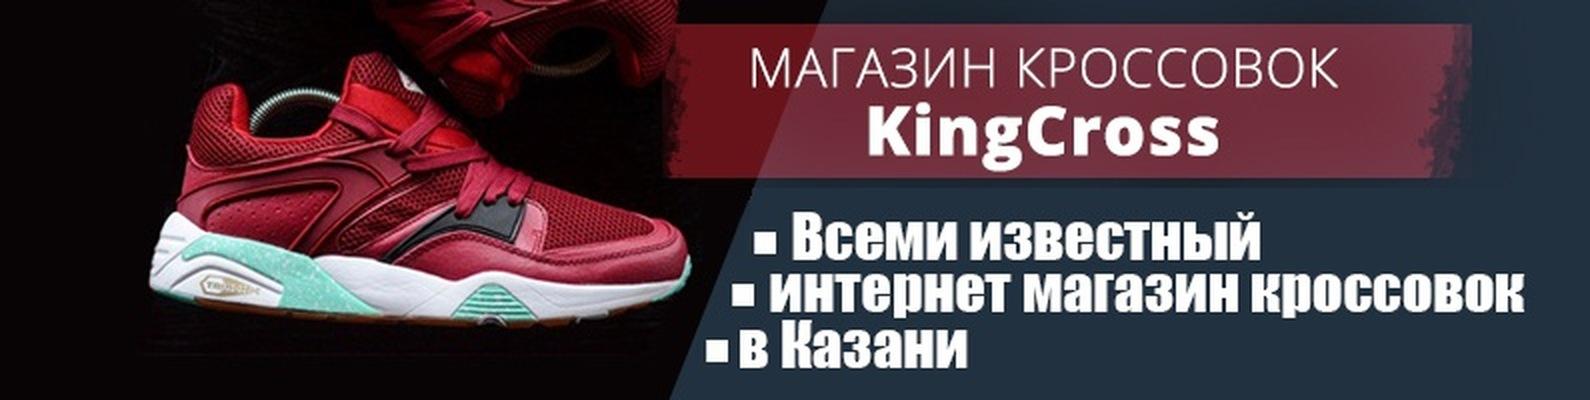 e48cba3d Магазин KingCross - Кроссовки в Казани | ВКонтакте